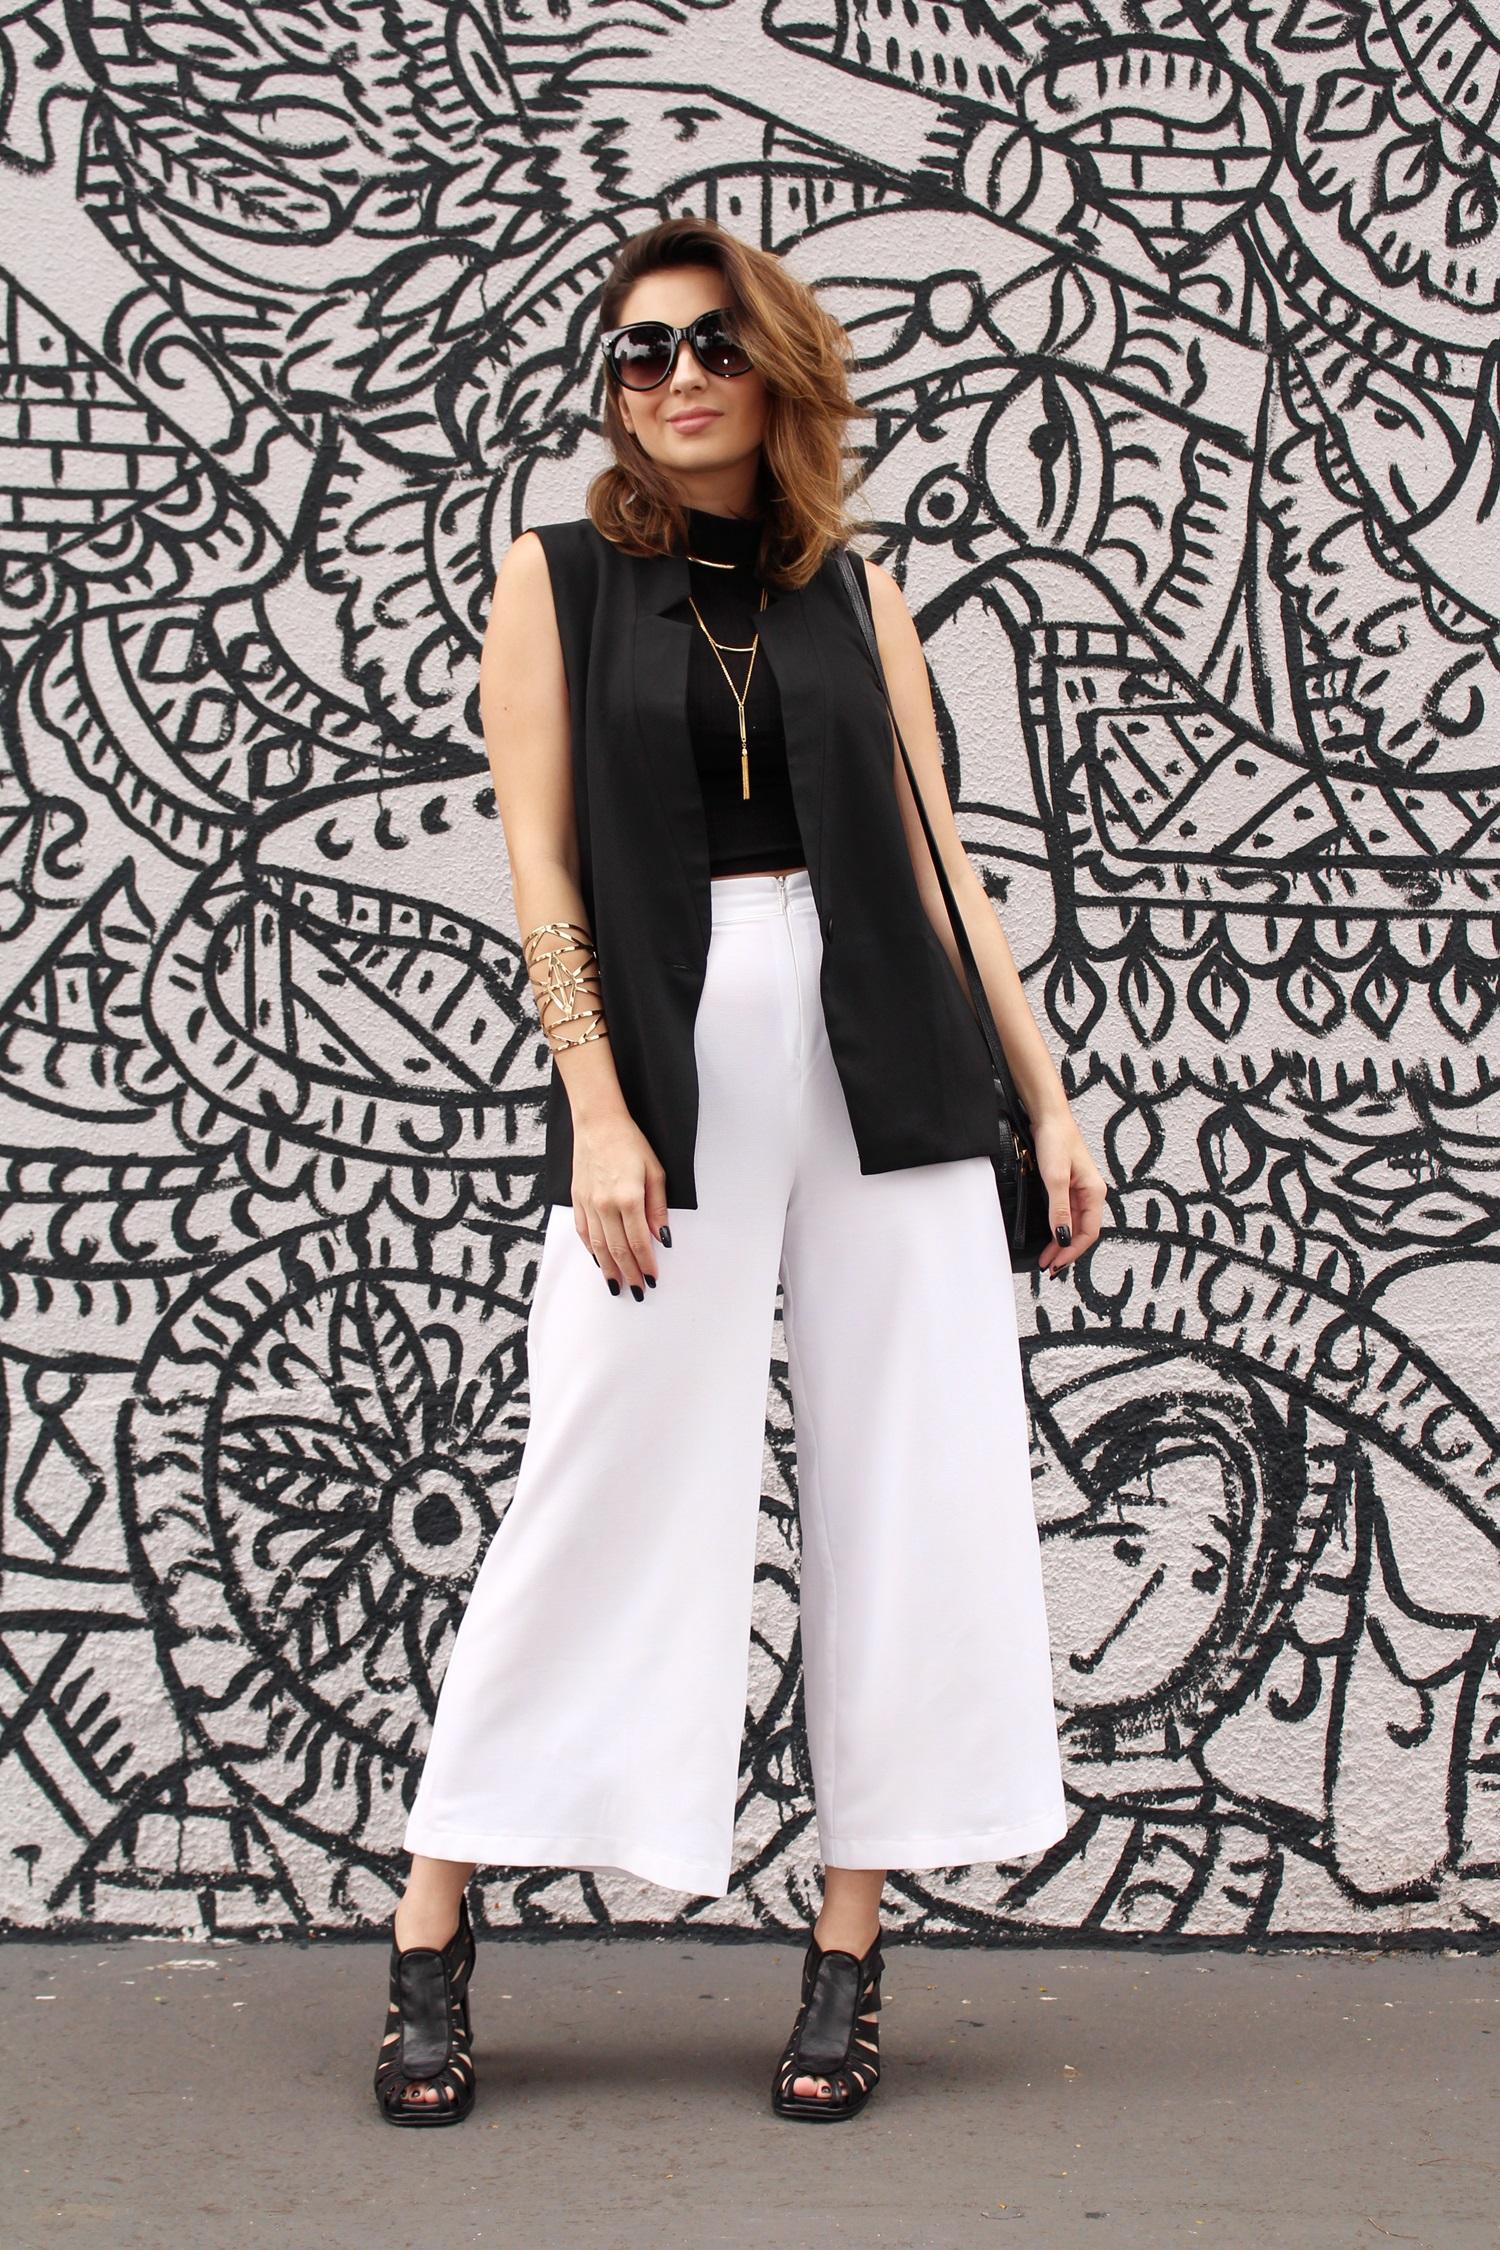 sandalia-salto-grosso-look-cool-fashionista-moderno-minimalista-pantacourt-colete-gola-alta-blog-vanduarte-7